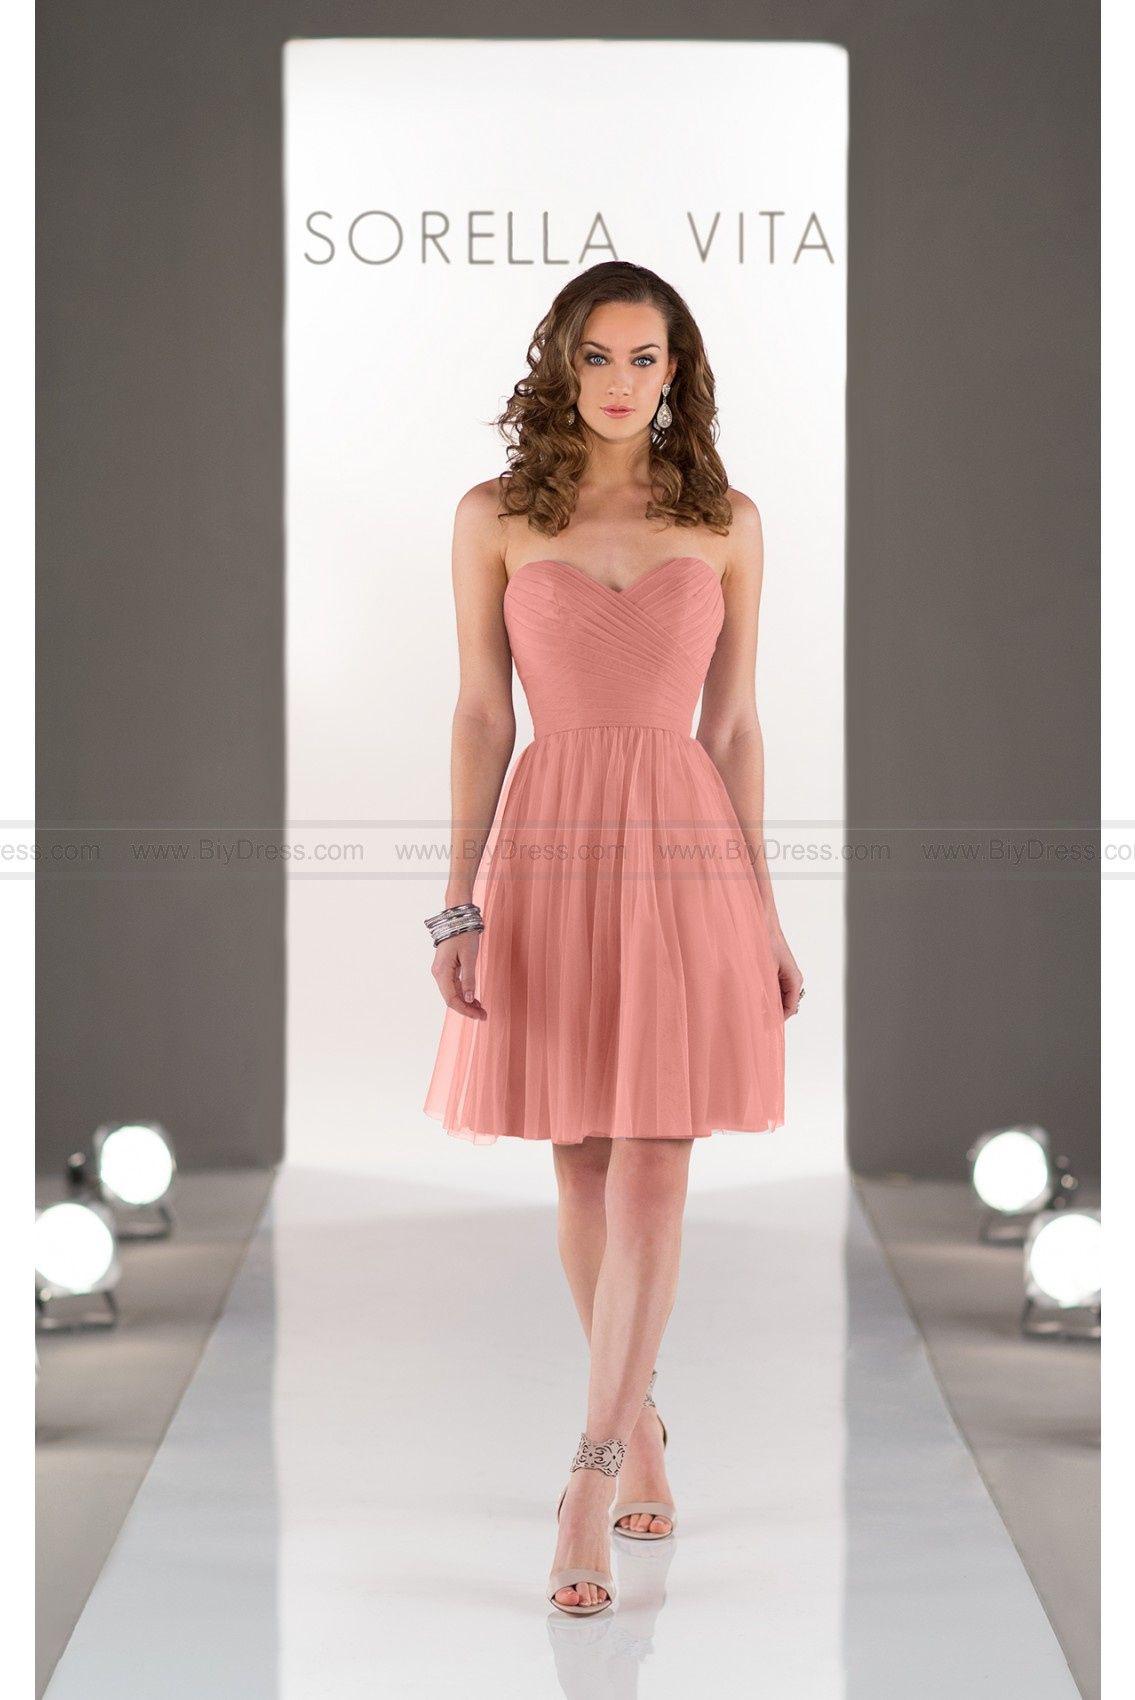 Sorella Vita Elegant Cocktail Dresses Style 8485 by baiqiu1415 ...